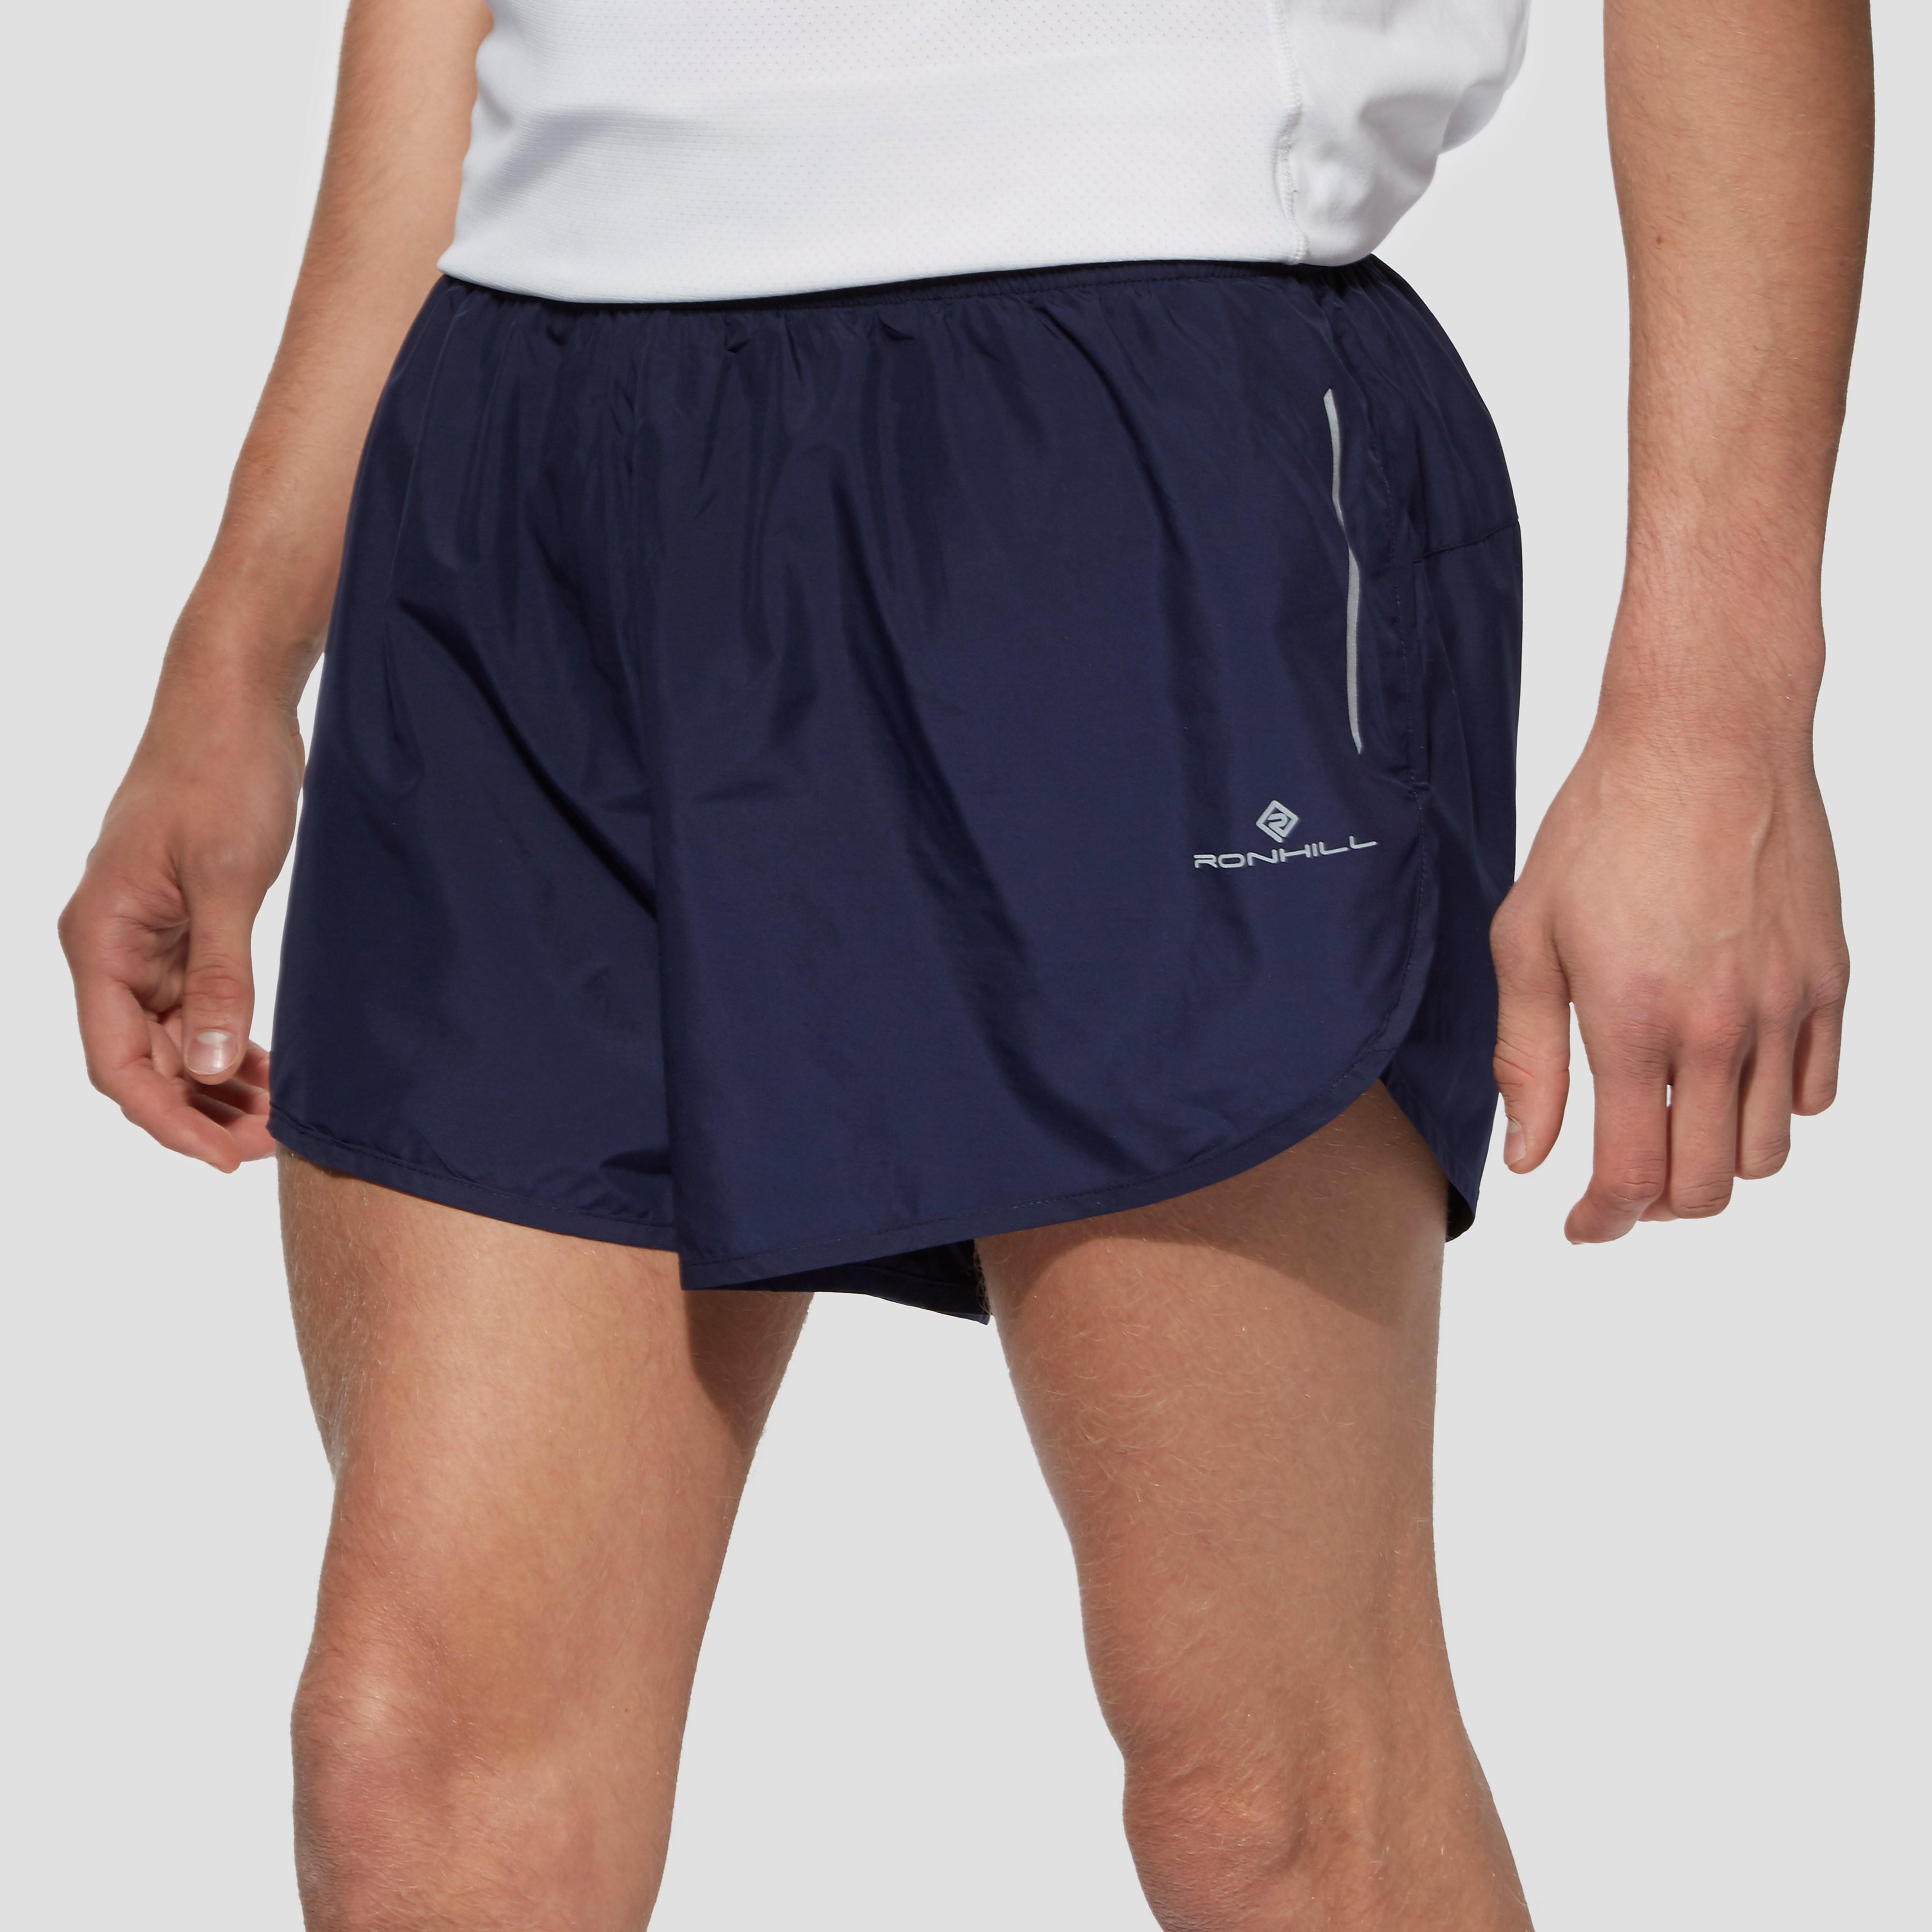 Ronhill Pursuit Men's Running Shorts